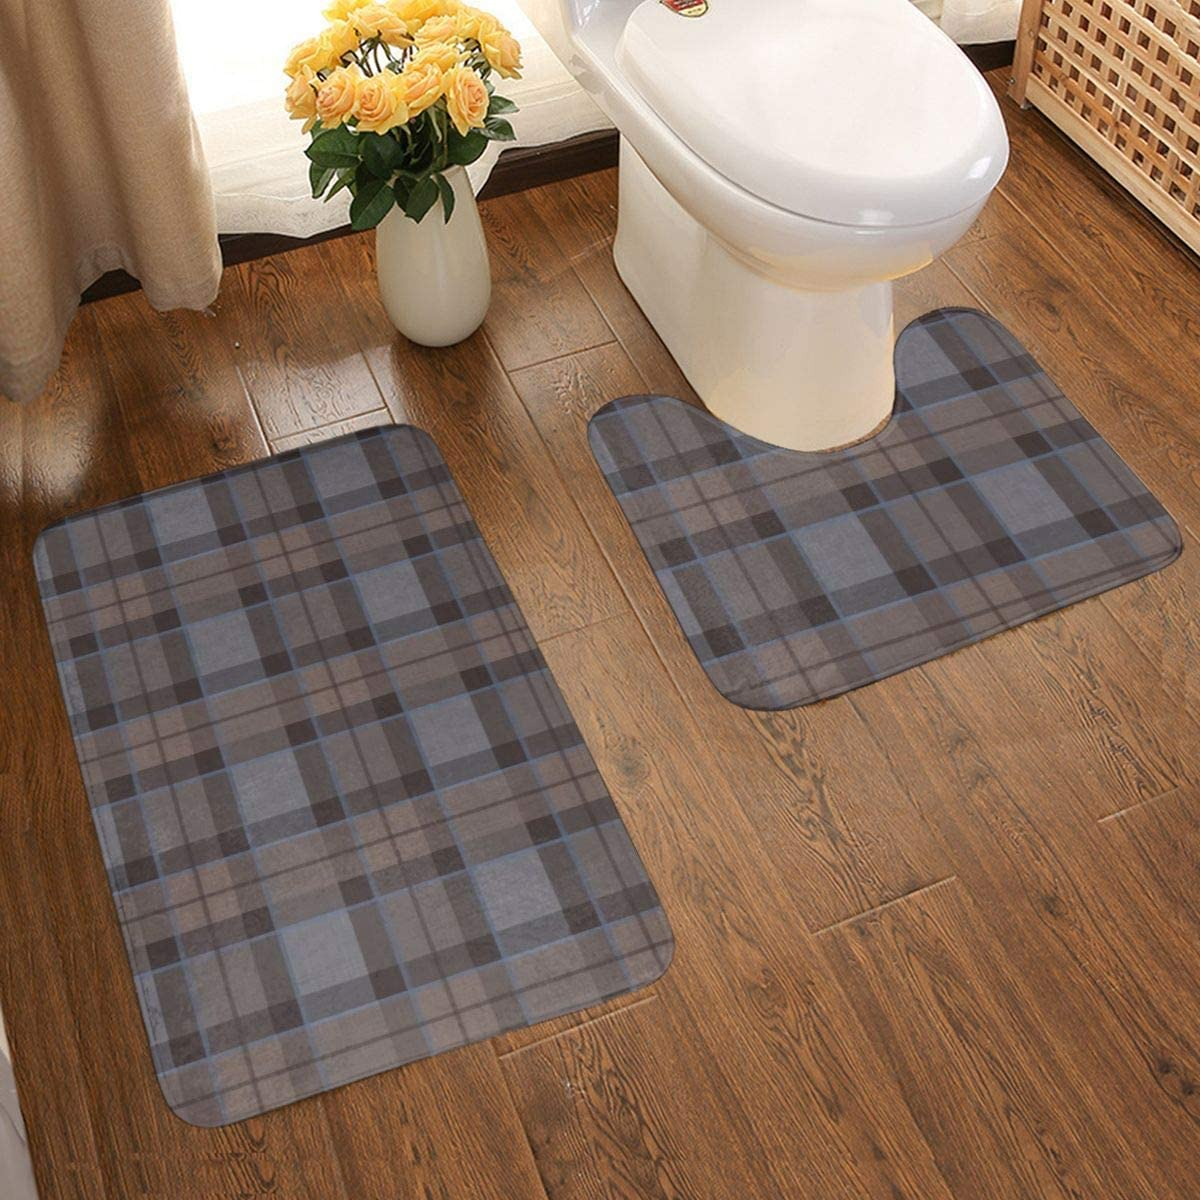 2pcs//Set Bathroom Rug Set Soft Non-Slip Bath Mats Toilet Washable Mat